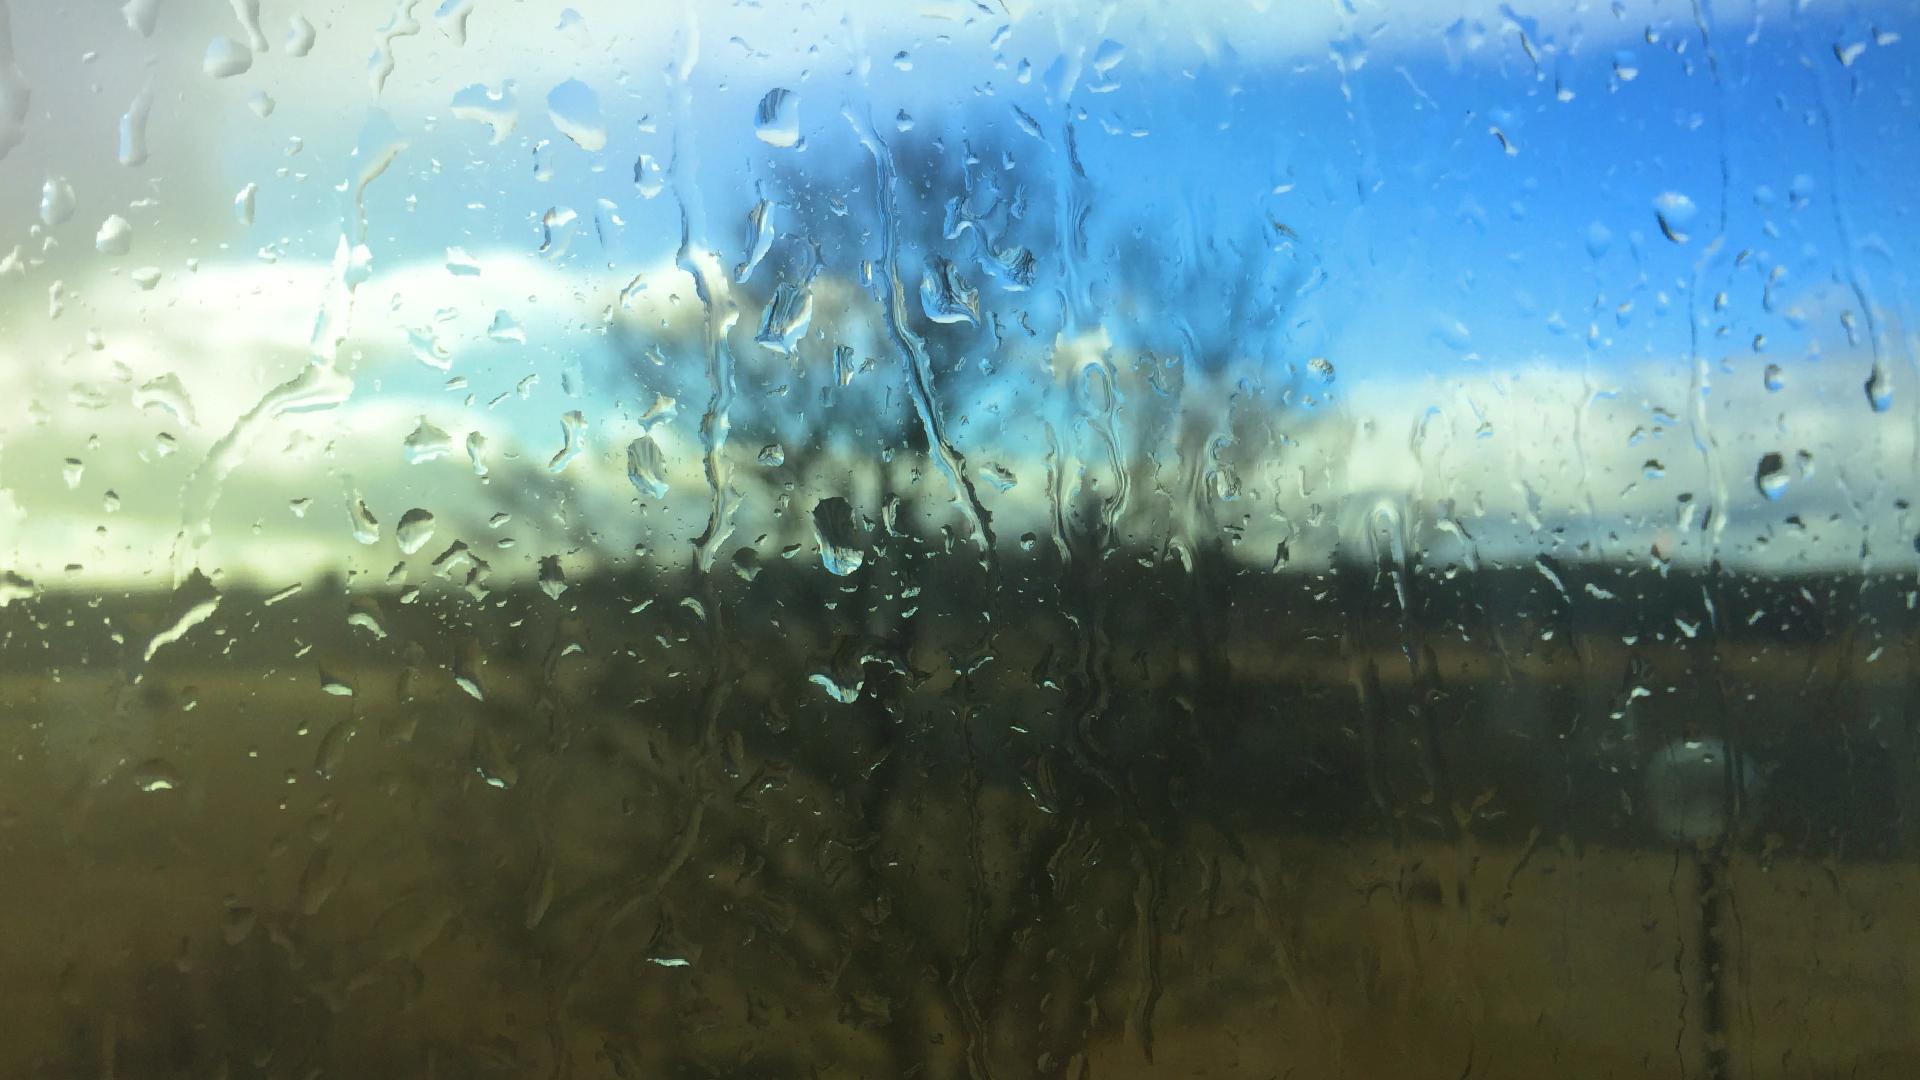 Sunlit Raindrops by RockLou